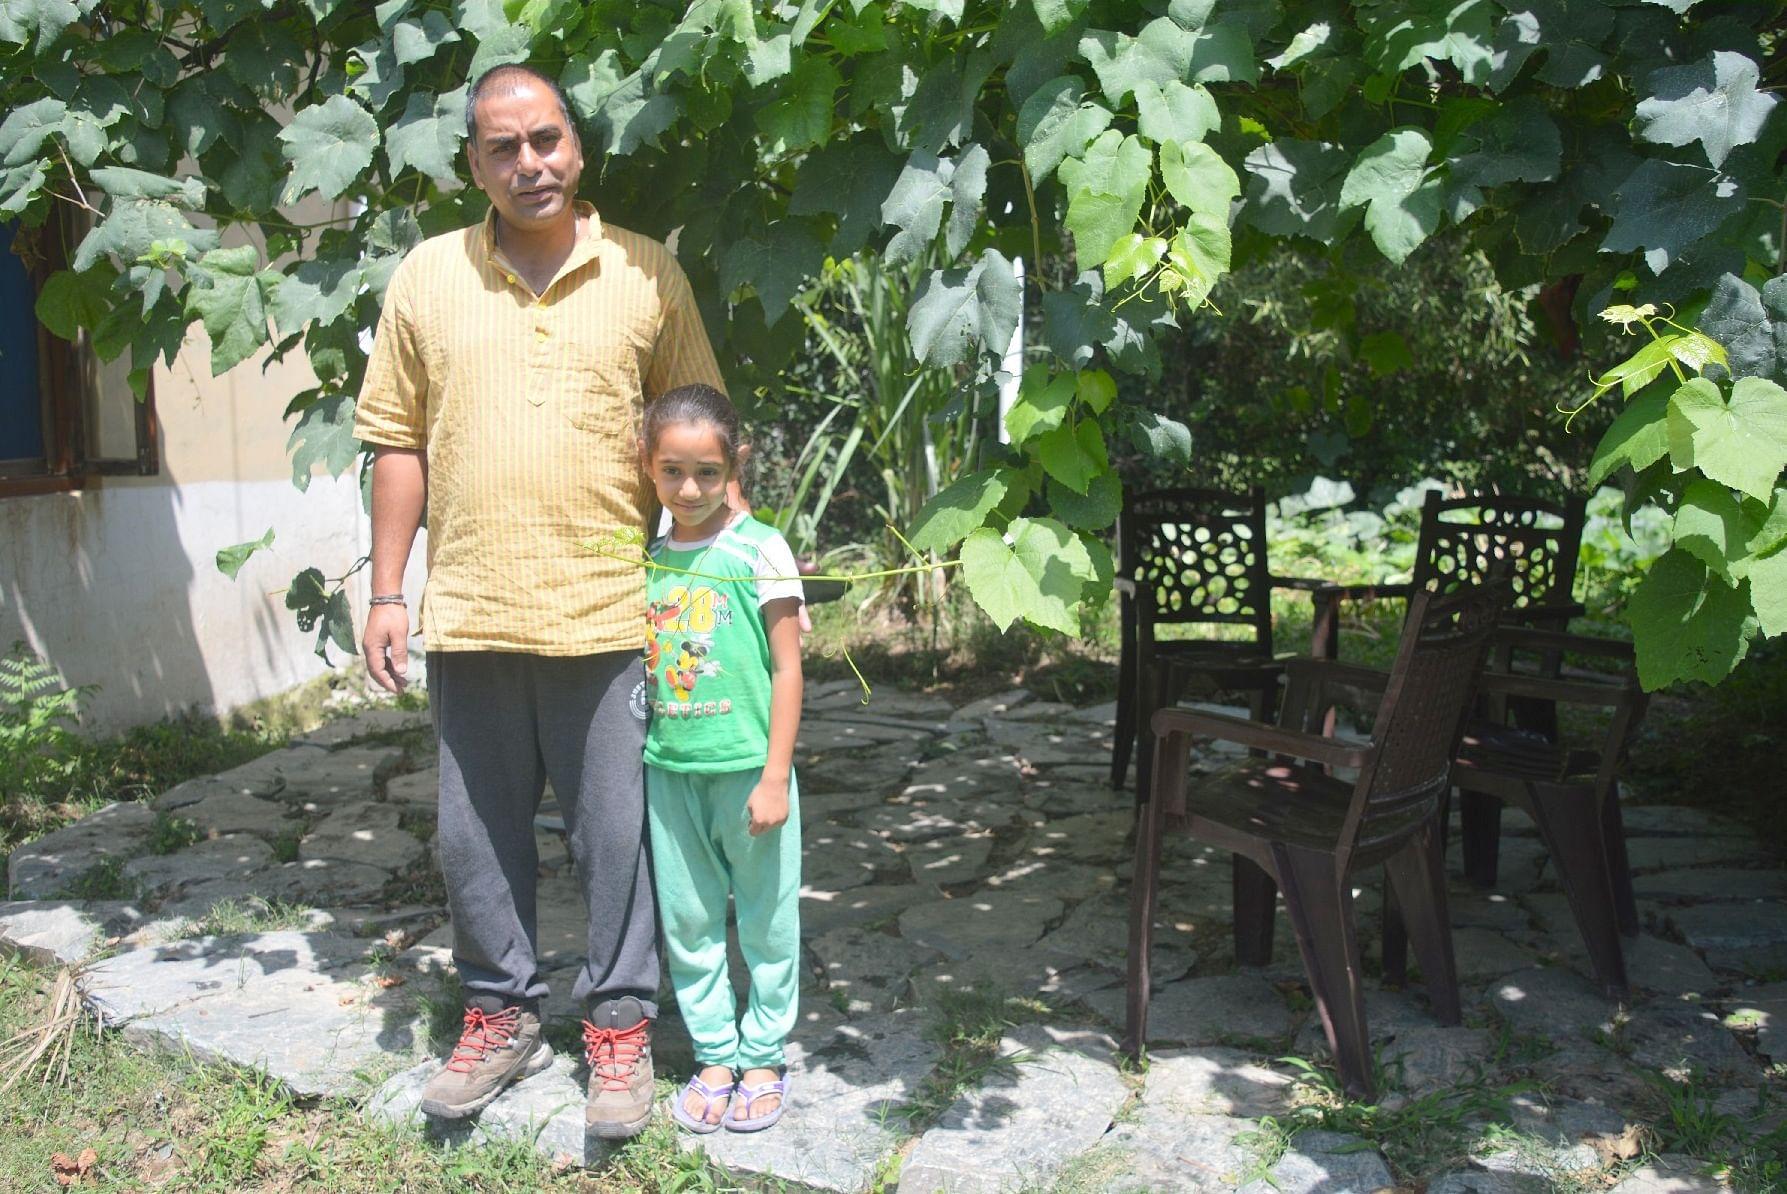 Yes to 'Desi Khaad', No to 'Angrezi Dawa': Visit this Organic Cafe